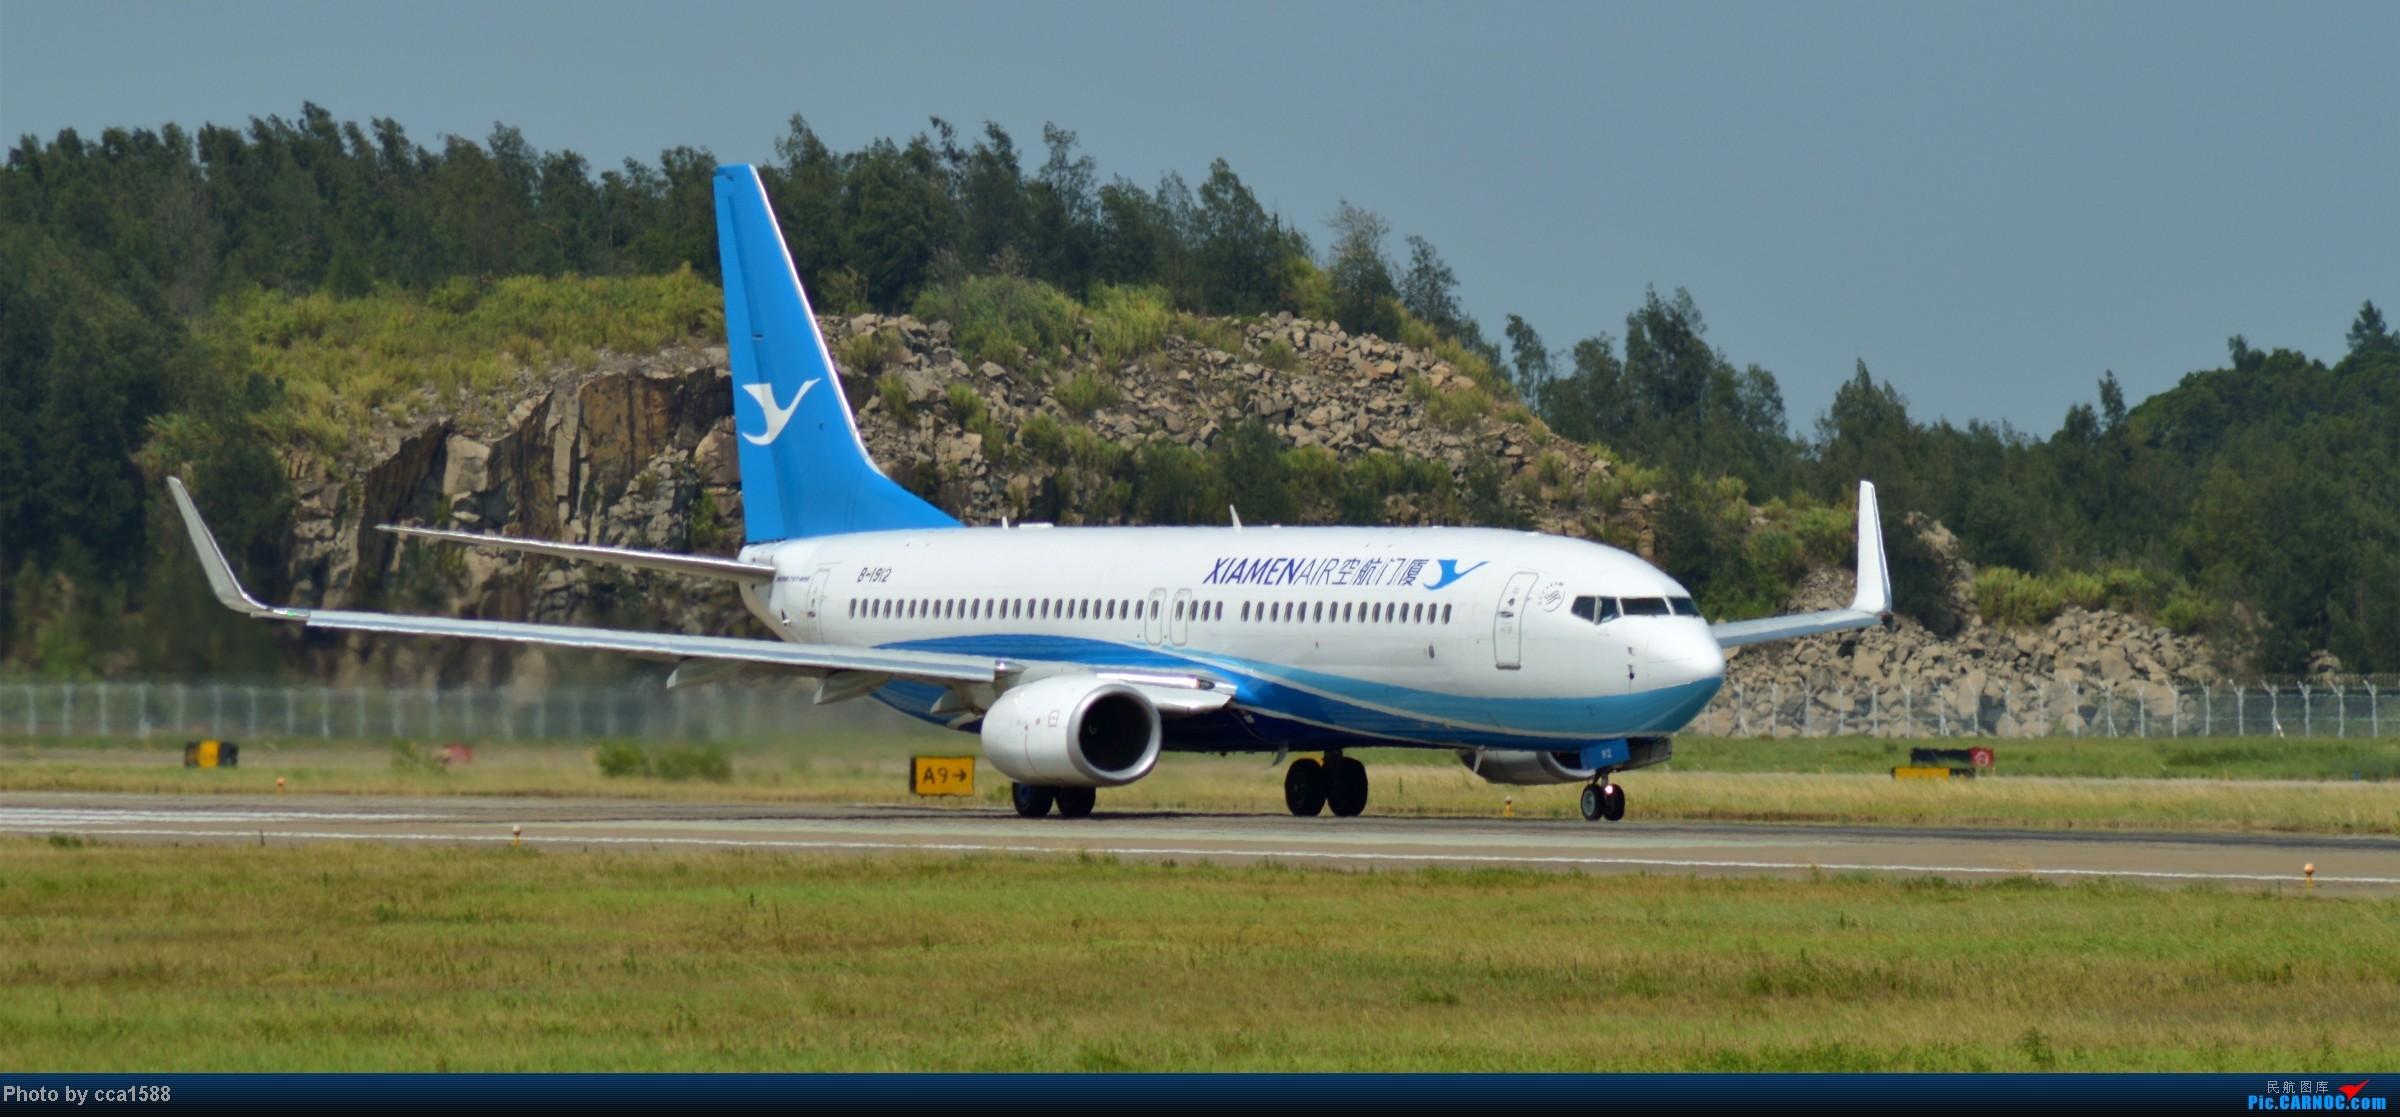 Re:[原创]7.25--FOC拍机集锦~(复兴、新舟60、还有更多惊喜~!) BOEING 737-800 B-1912 中国福州长乐机场